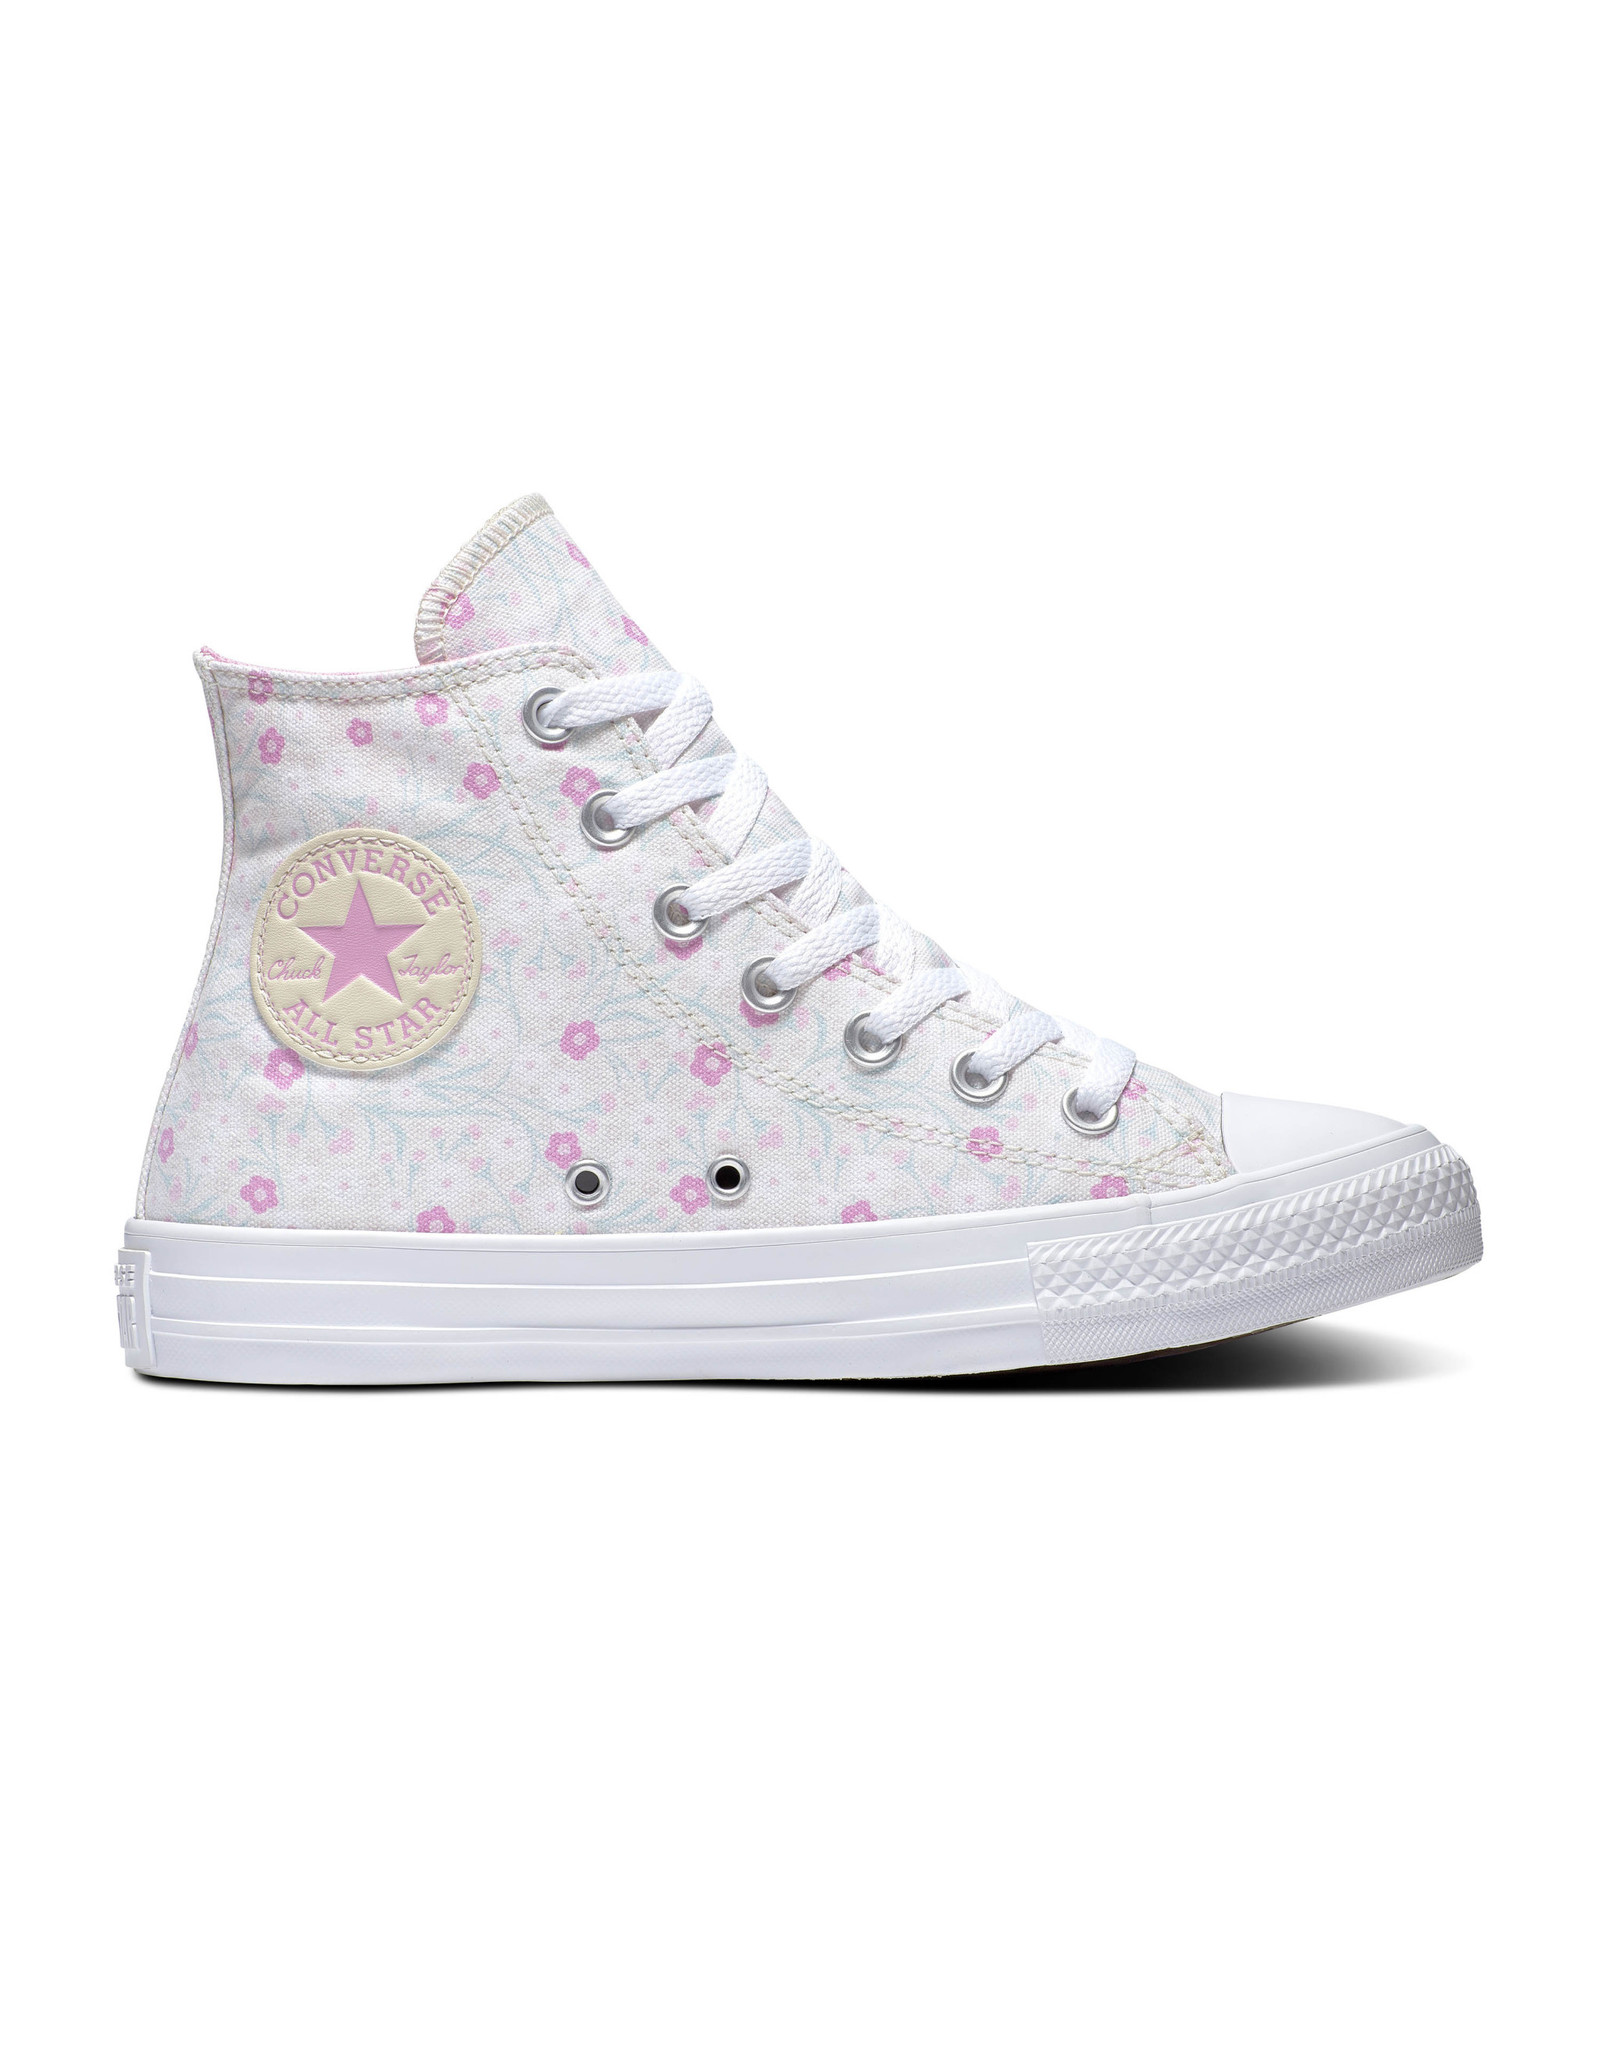 CONVERSE CHUCK TAYLOR ALL STAR  HI WHITE/PEONY PINK/OCEAN MINT C20FLO-567032C